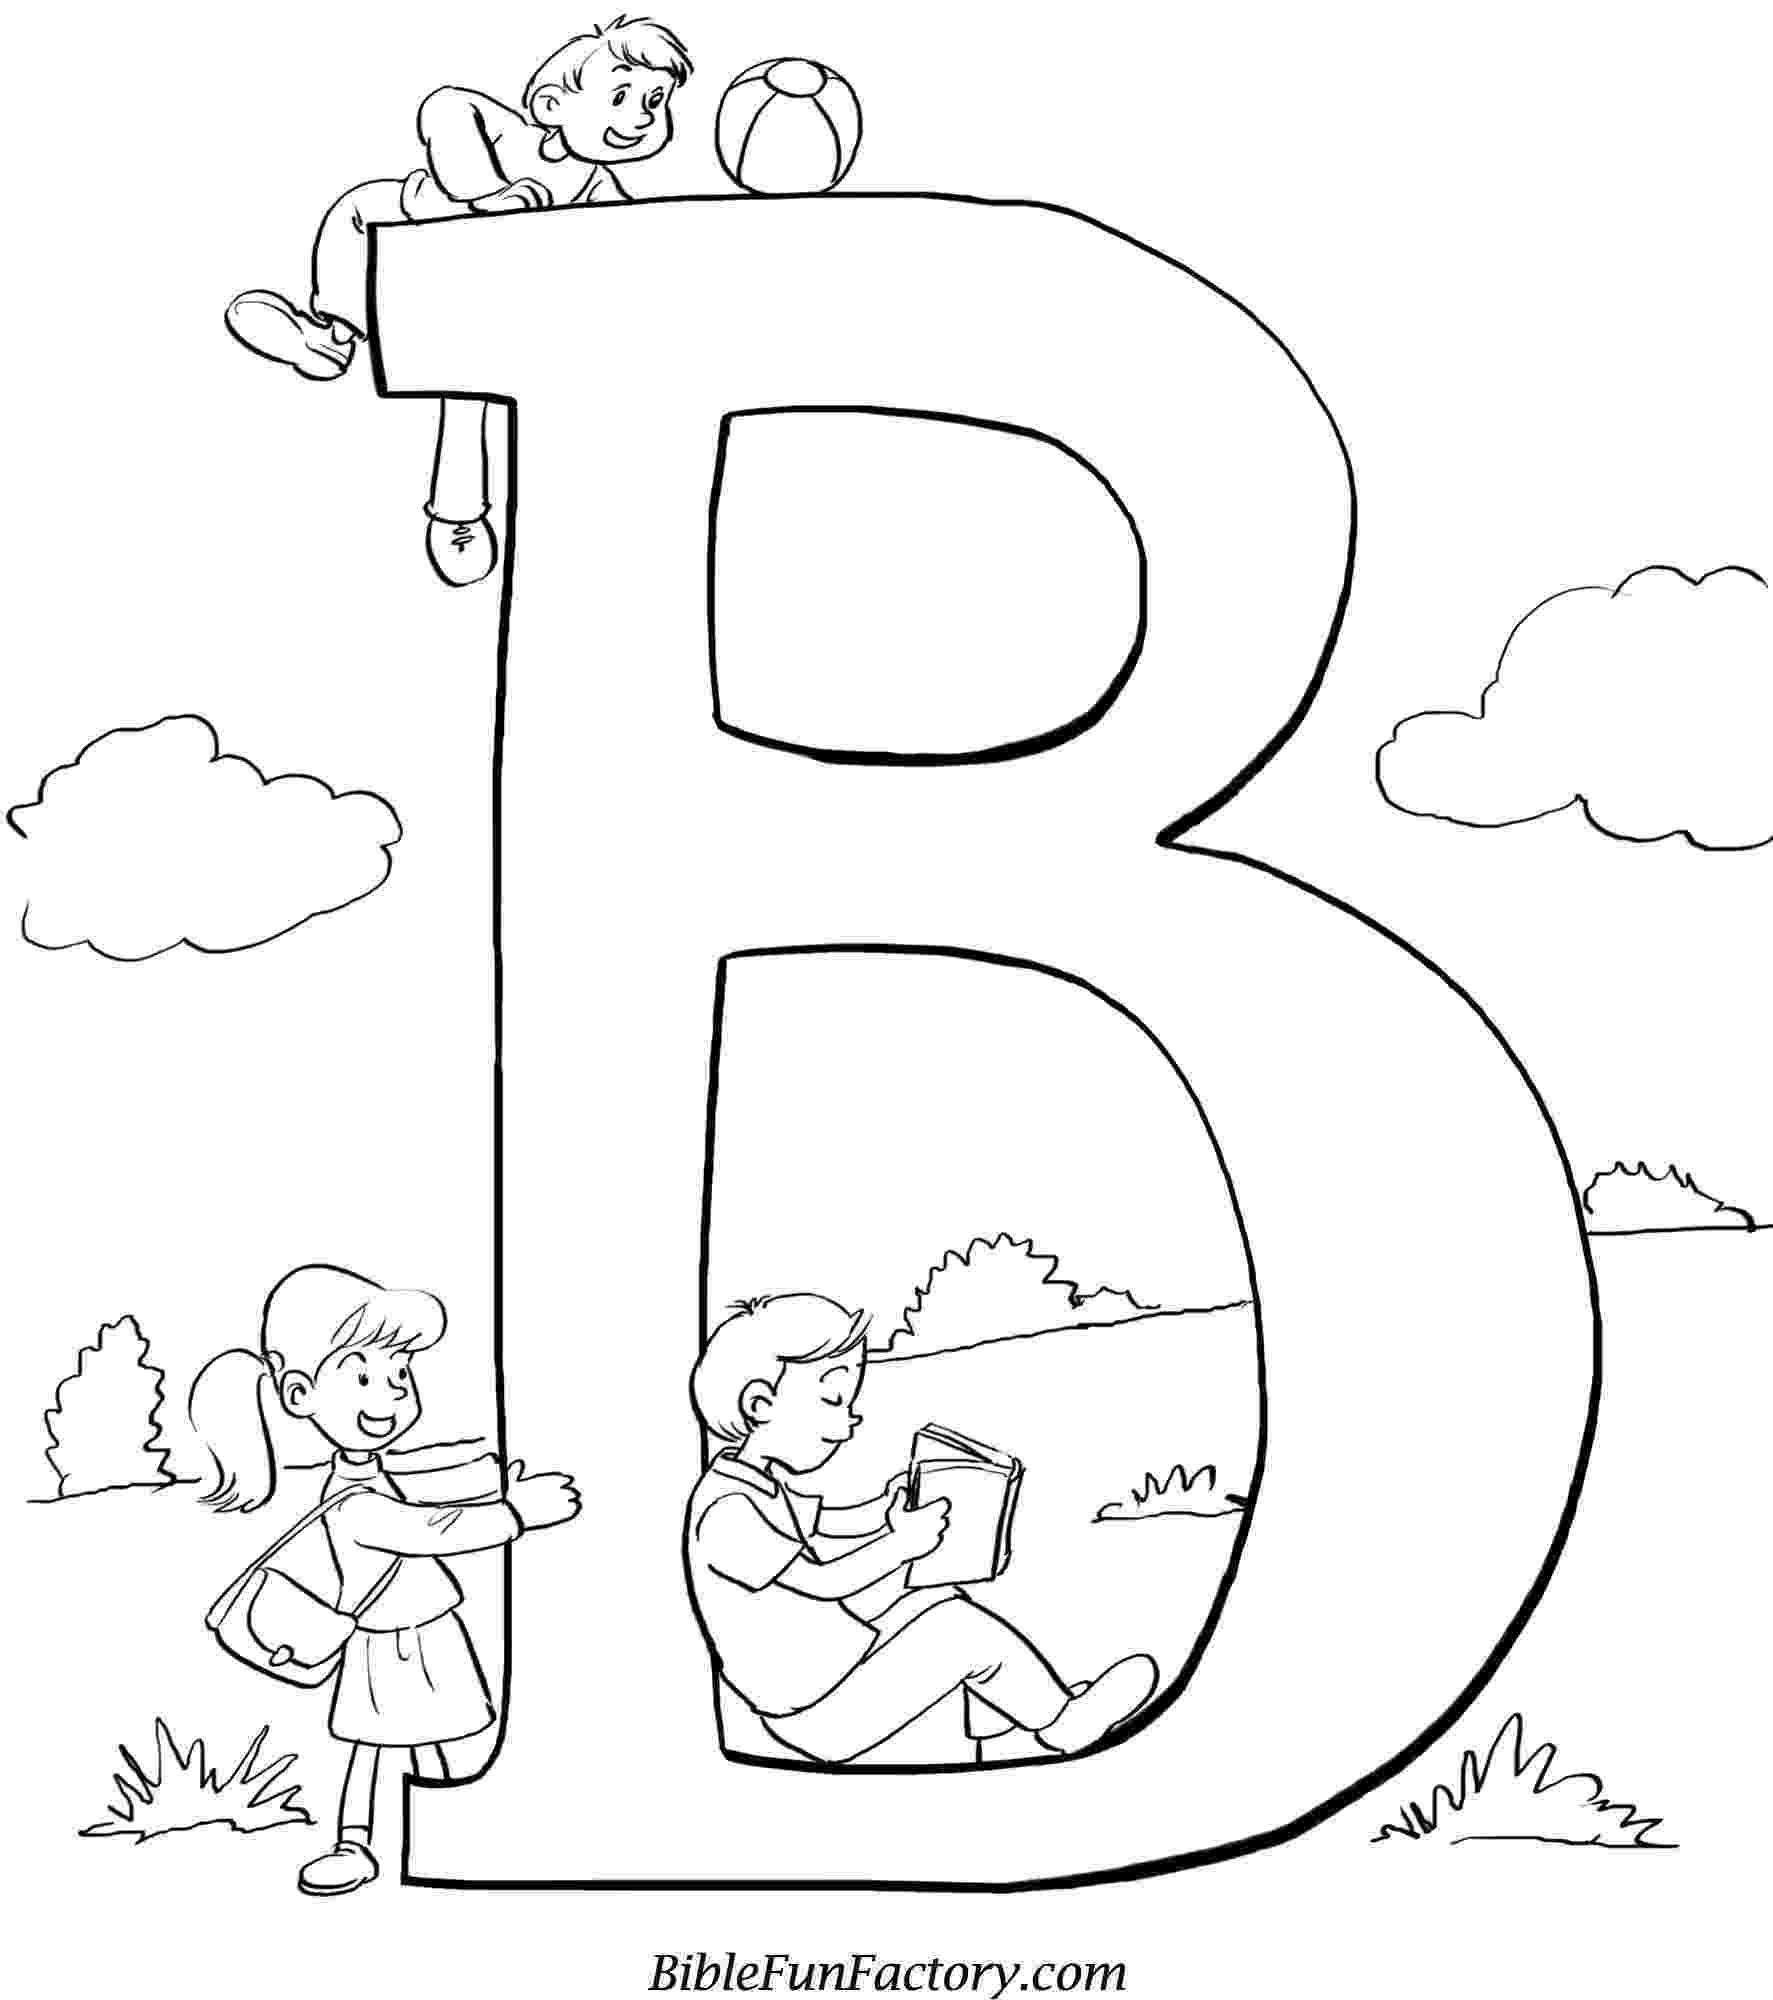 printable preschool coloring pages printable preschool coloring pages 005 pages preschool printable coloring